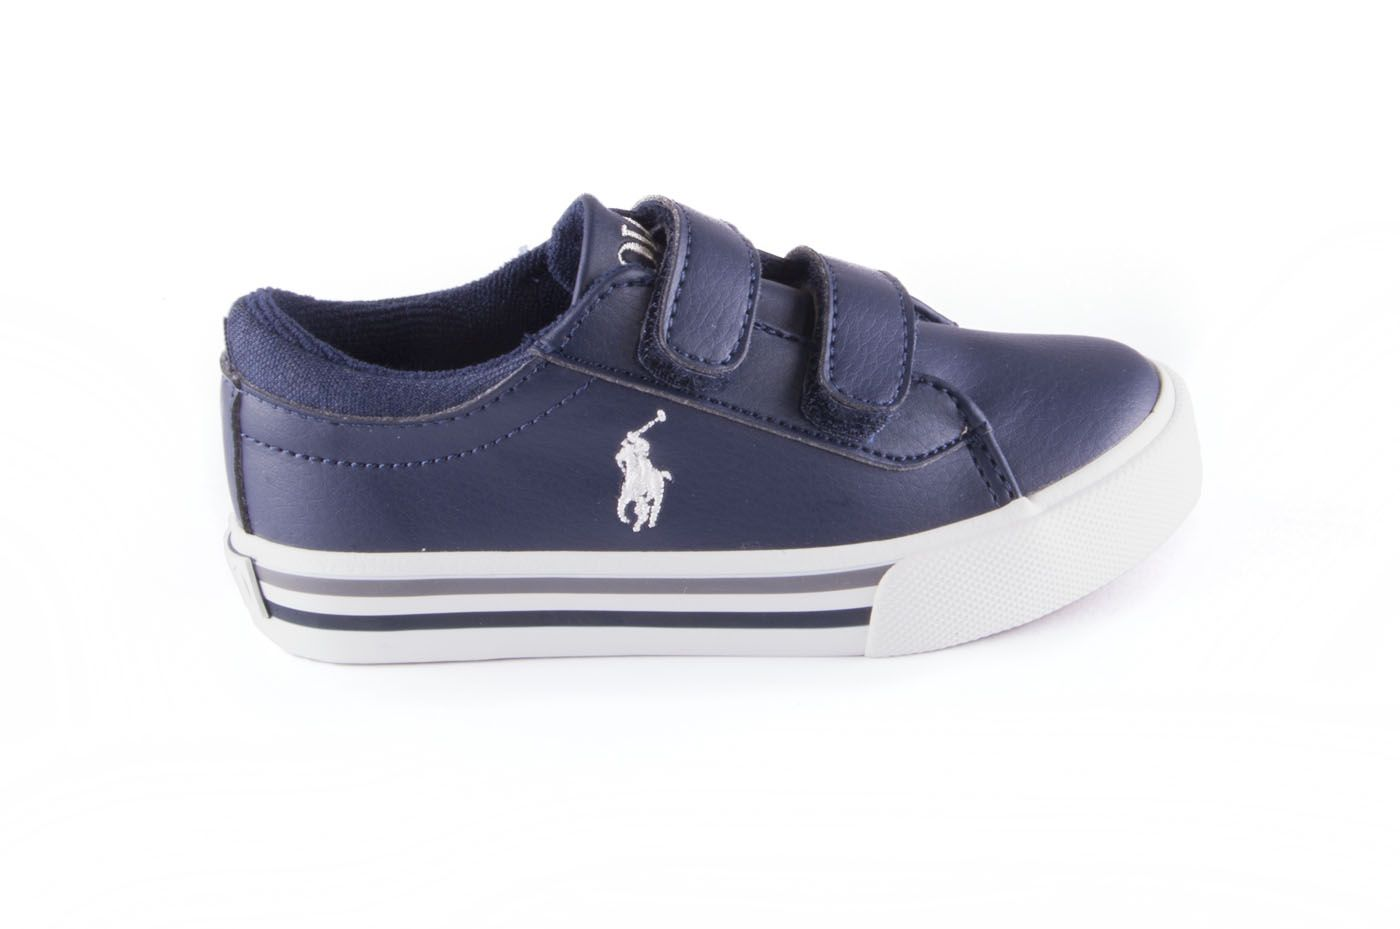 35c928d44a7 Comprar zapato tipo JOVEN NIÑO estilo BLUCHER COLOR AZUL PIEL ...